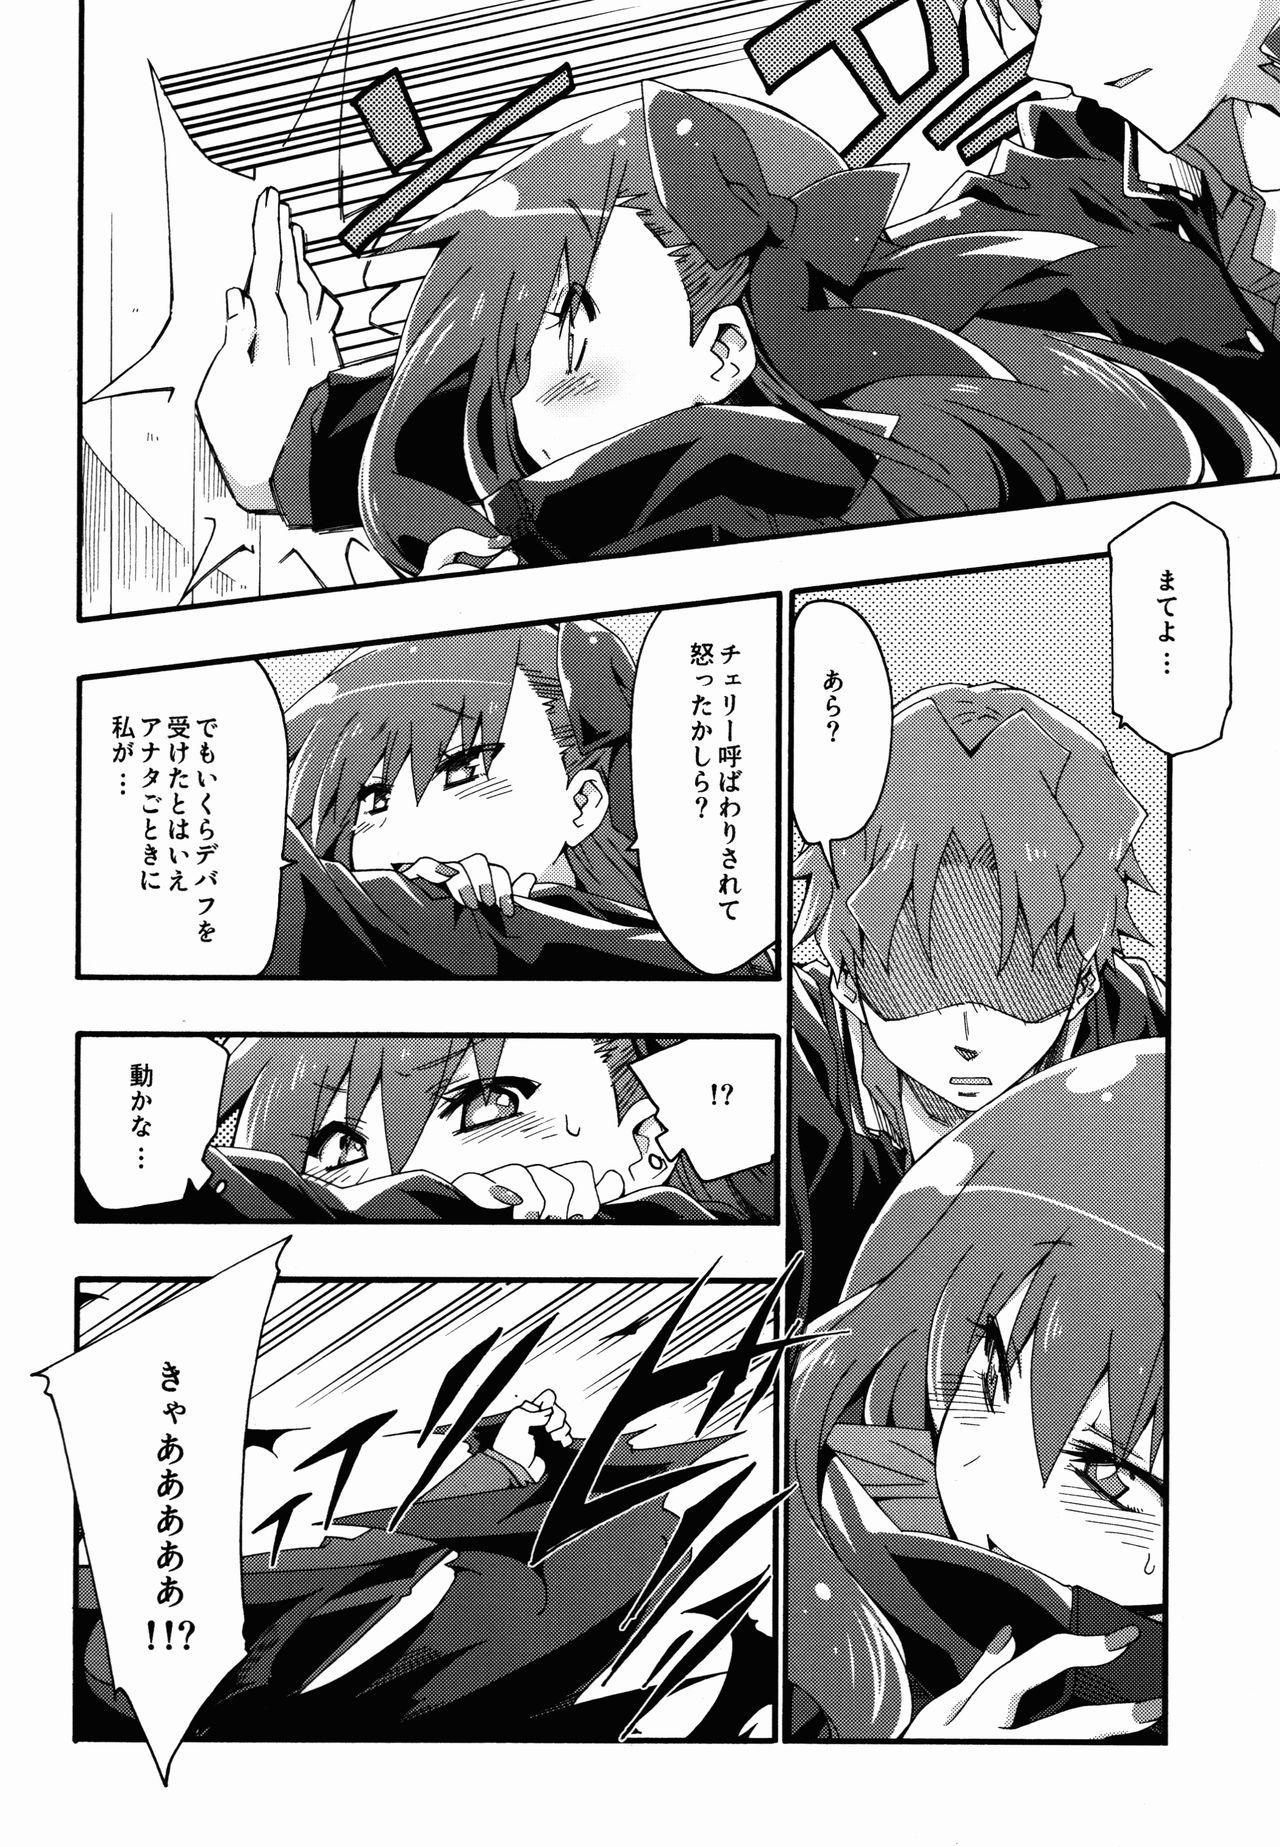 Melty/kiss 15